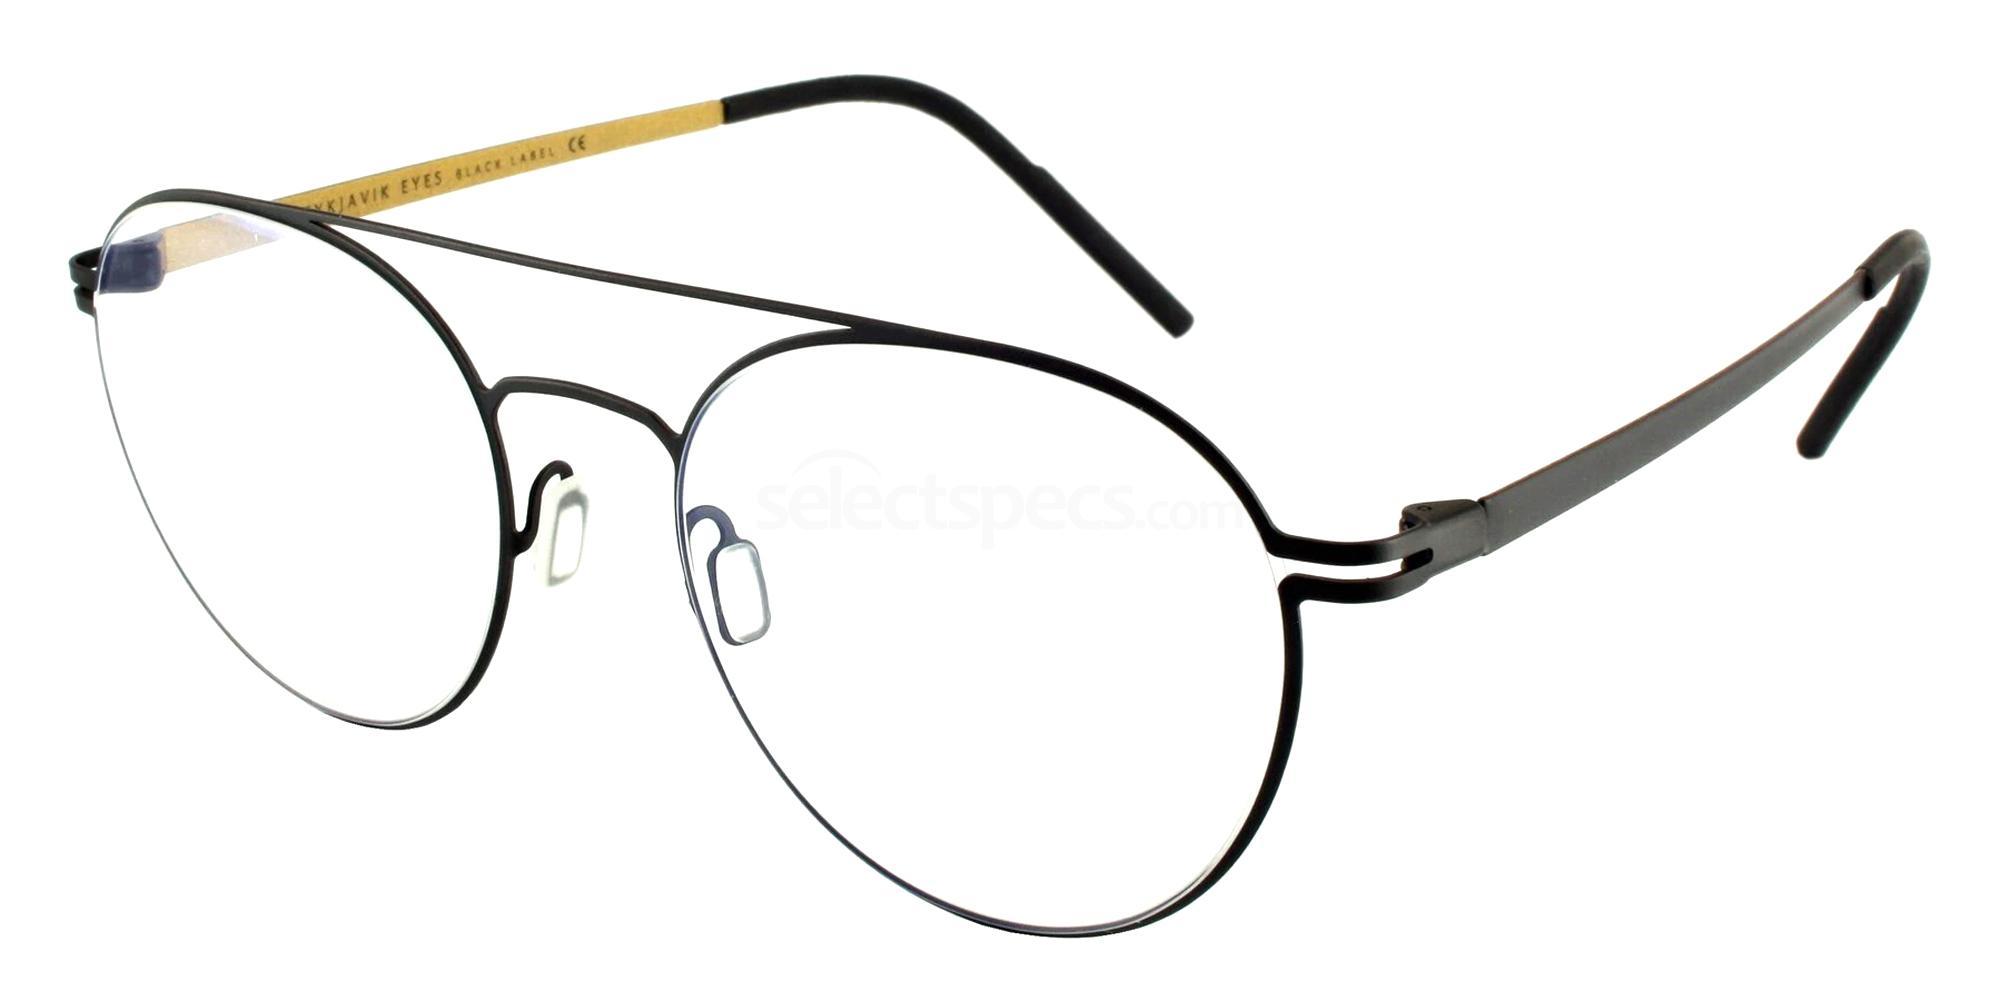 C1 FULLA Glasses, Reykjavik Eyes Black Label